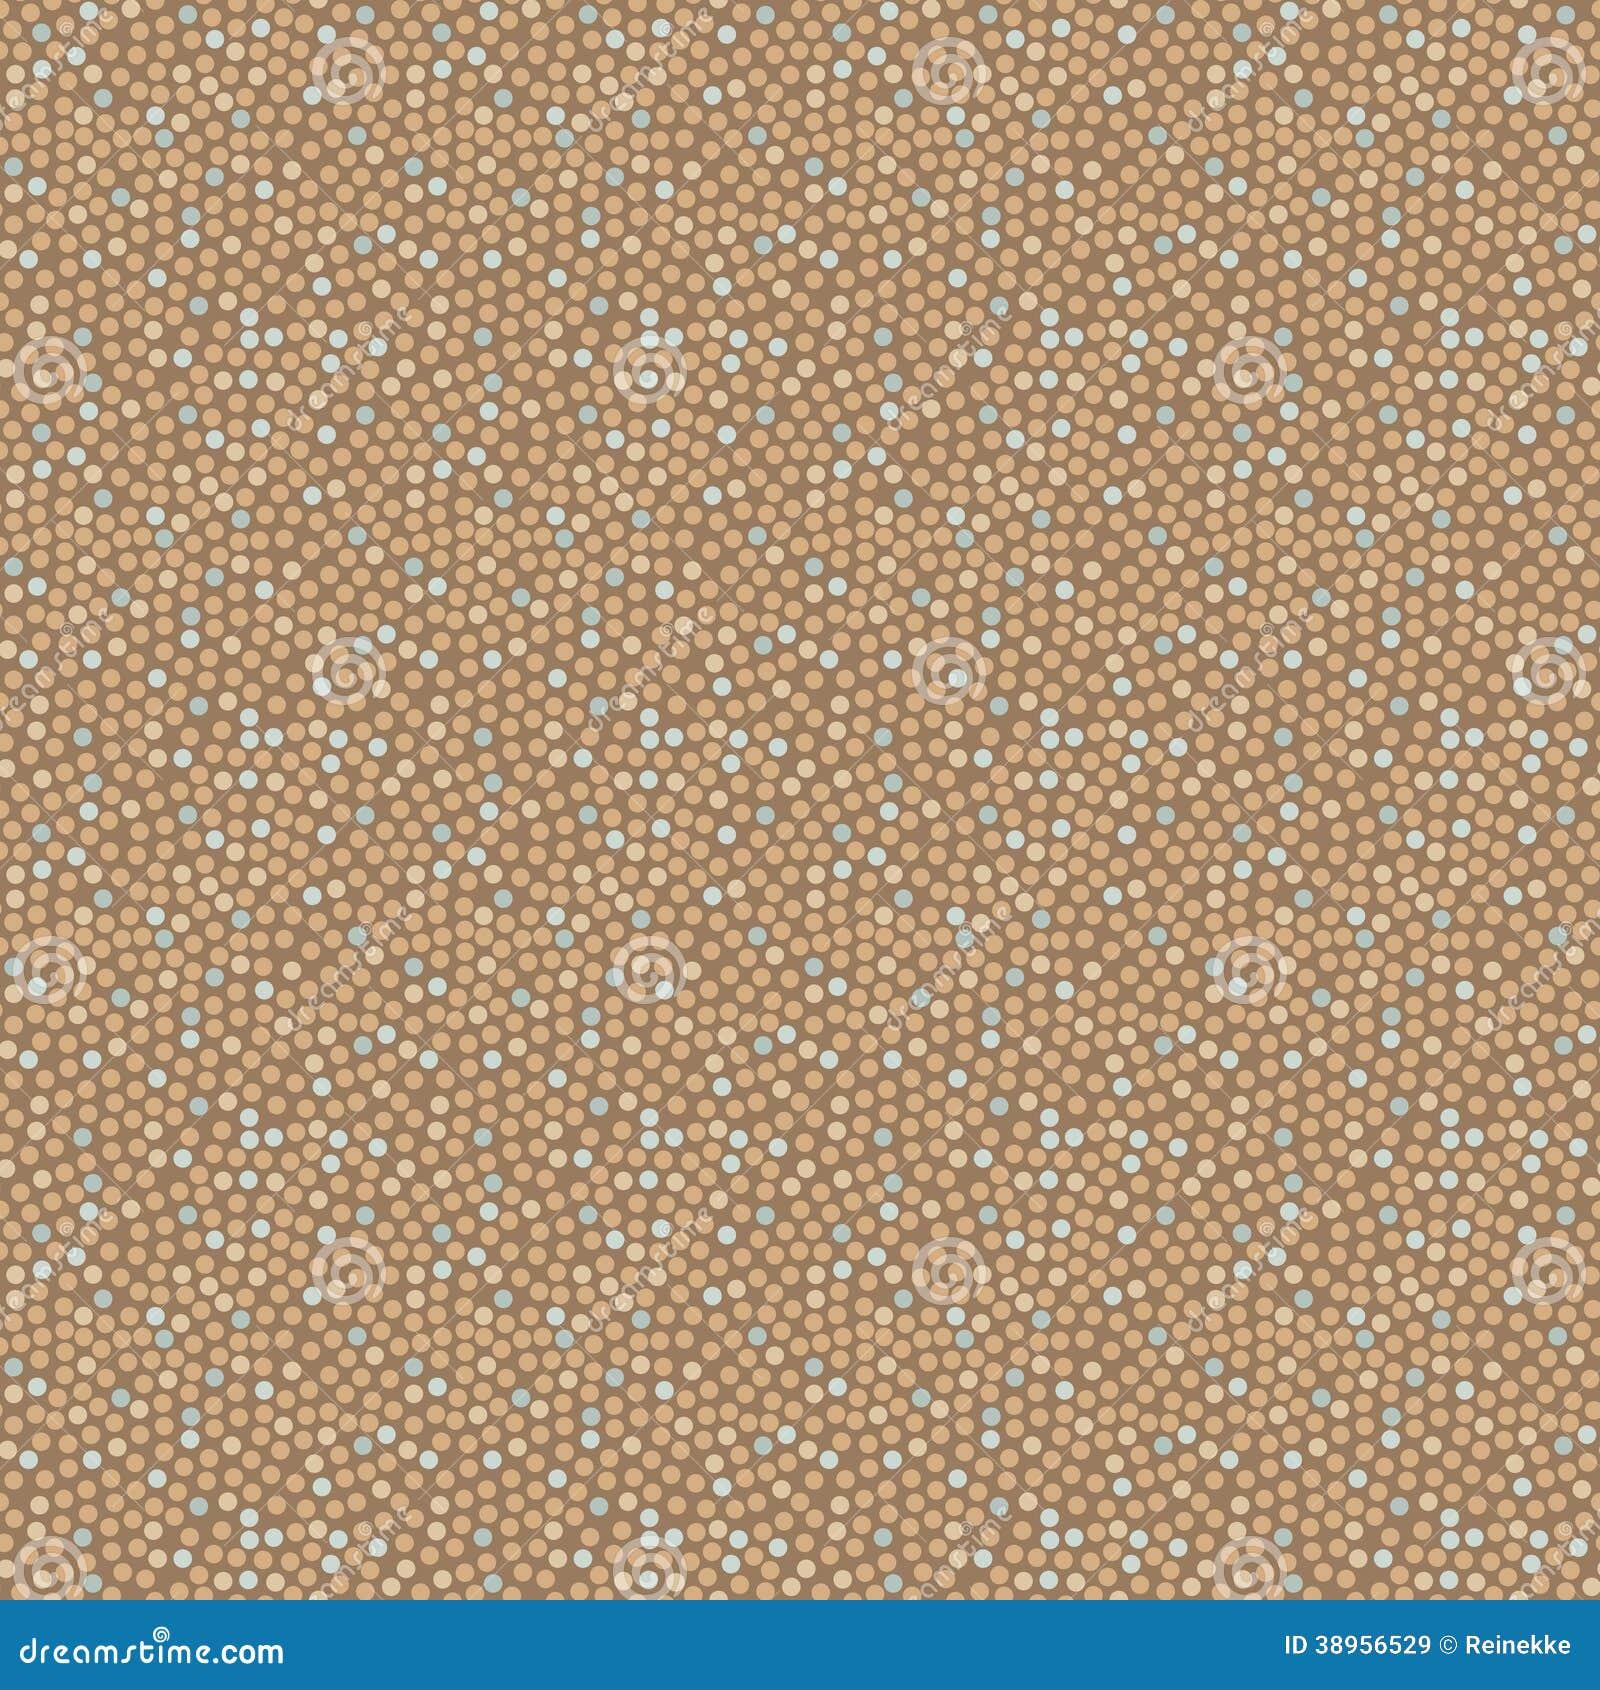 Dot Seamless Pattern Stock Vector - Image: 38956529